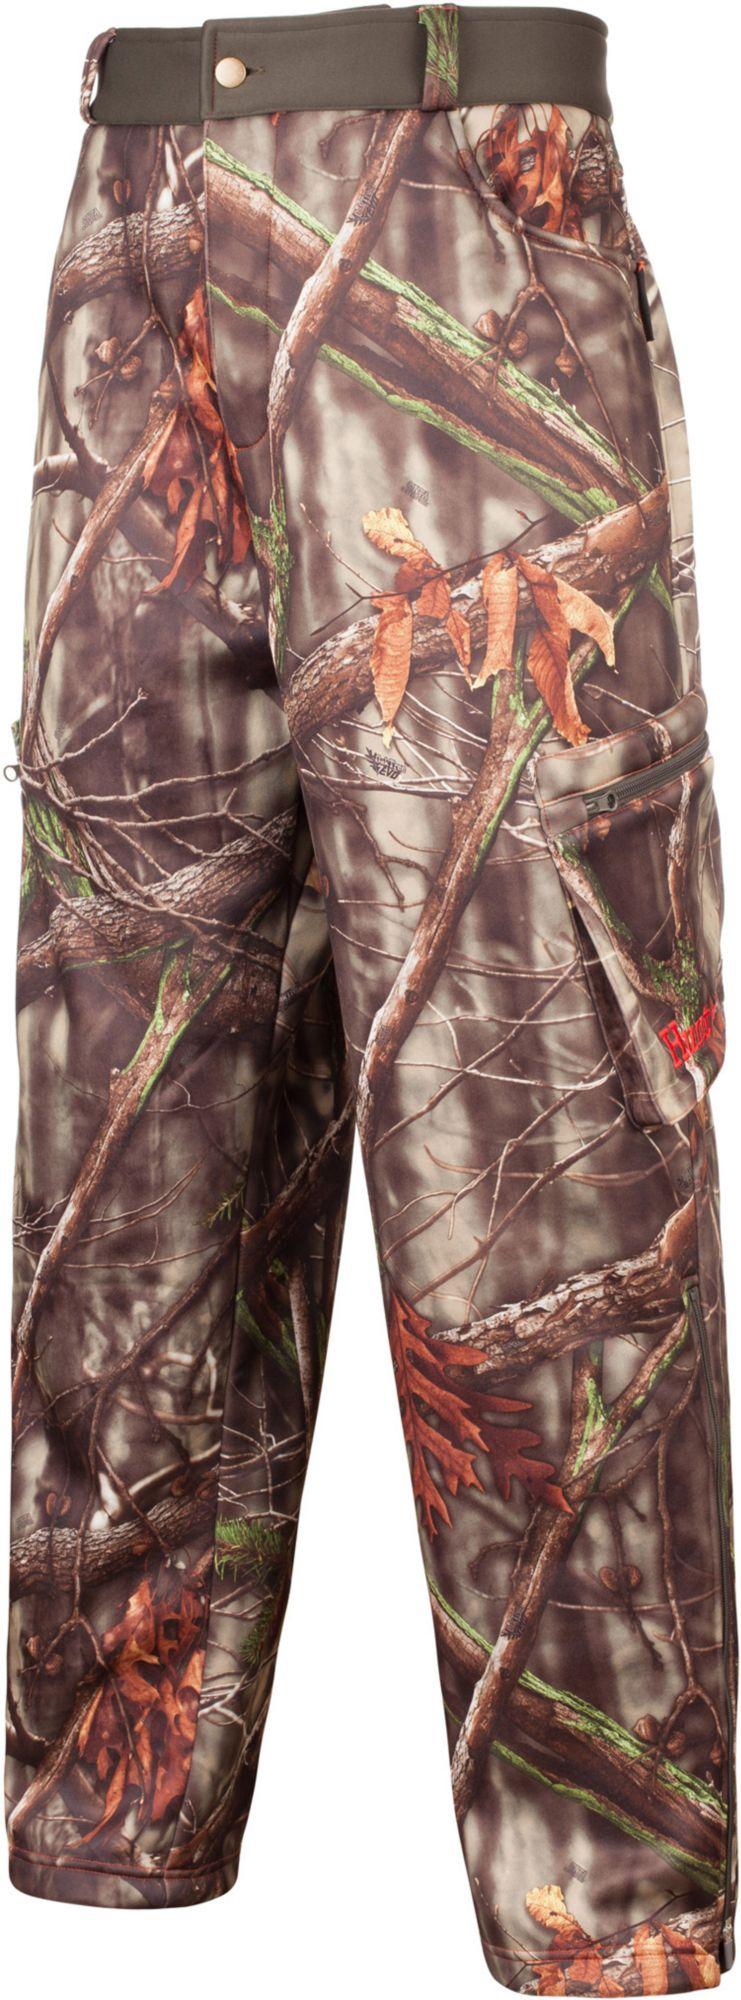 Huntworth Men's Soft Shell Hunting Pants, Size: Medium, Green thumbnail